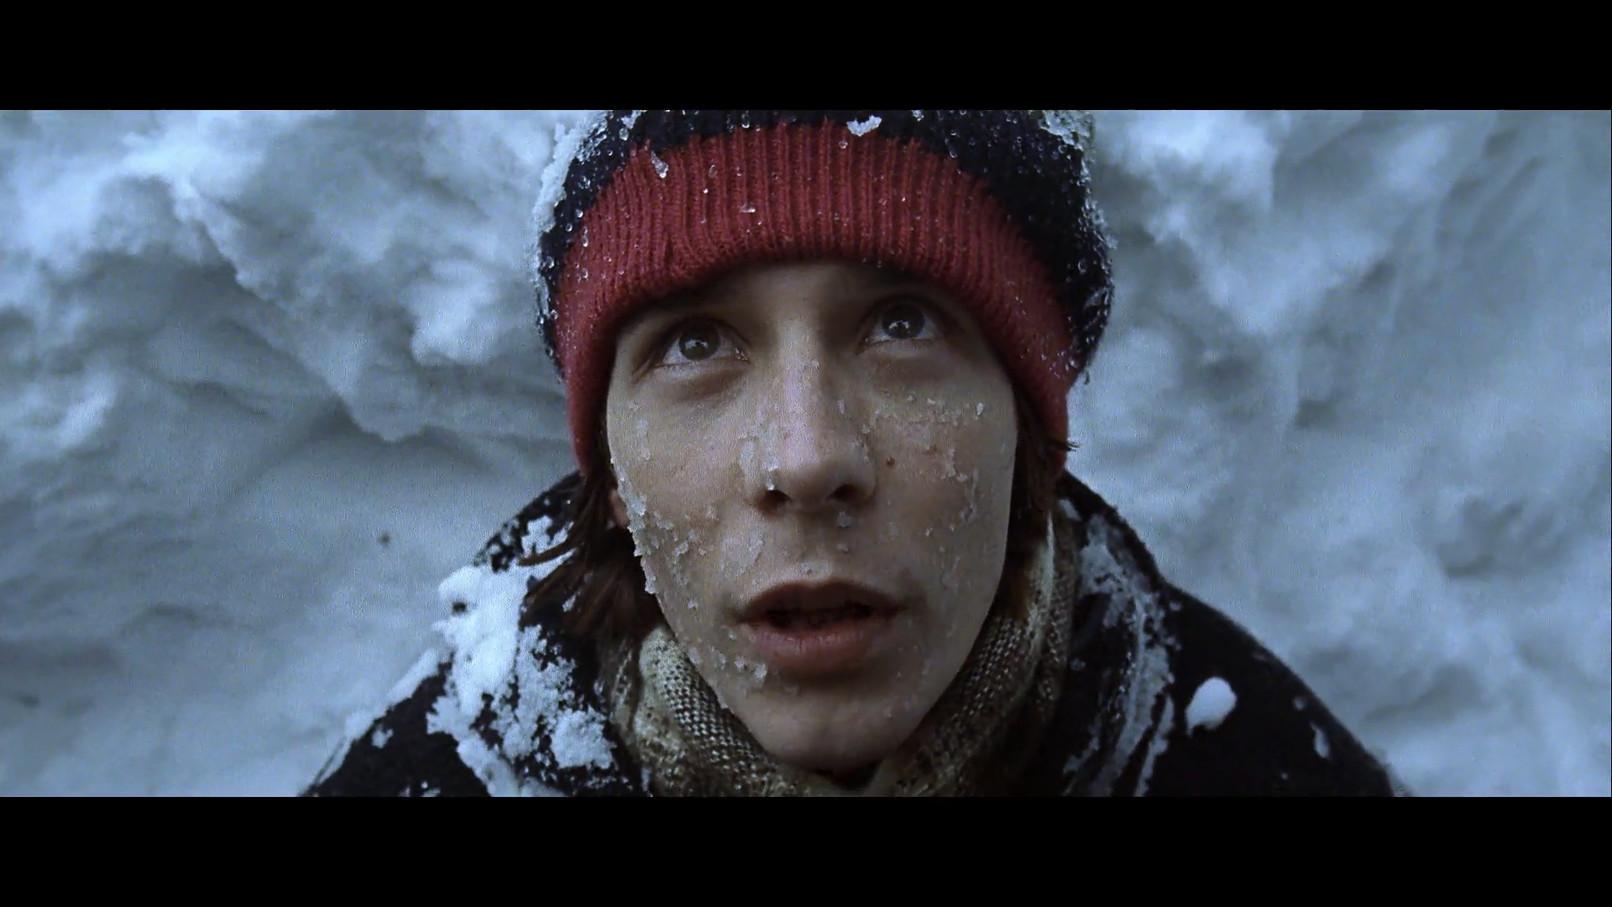 hUrcpv - Los amantes del círculo polar | 1998 | Romance. Drama | WEB-DL 1080p | castellano DD5.1 | 4,6 GB